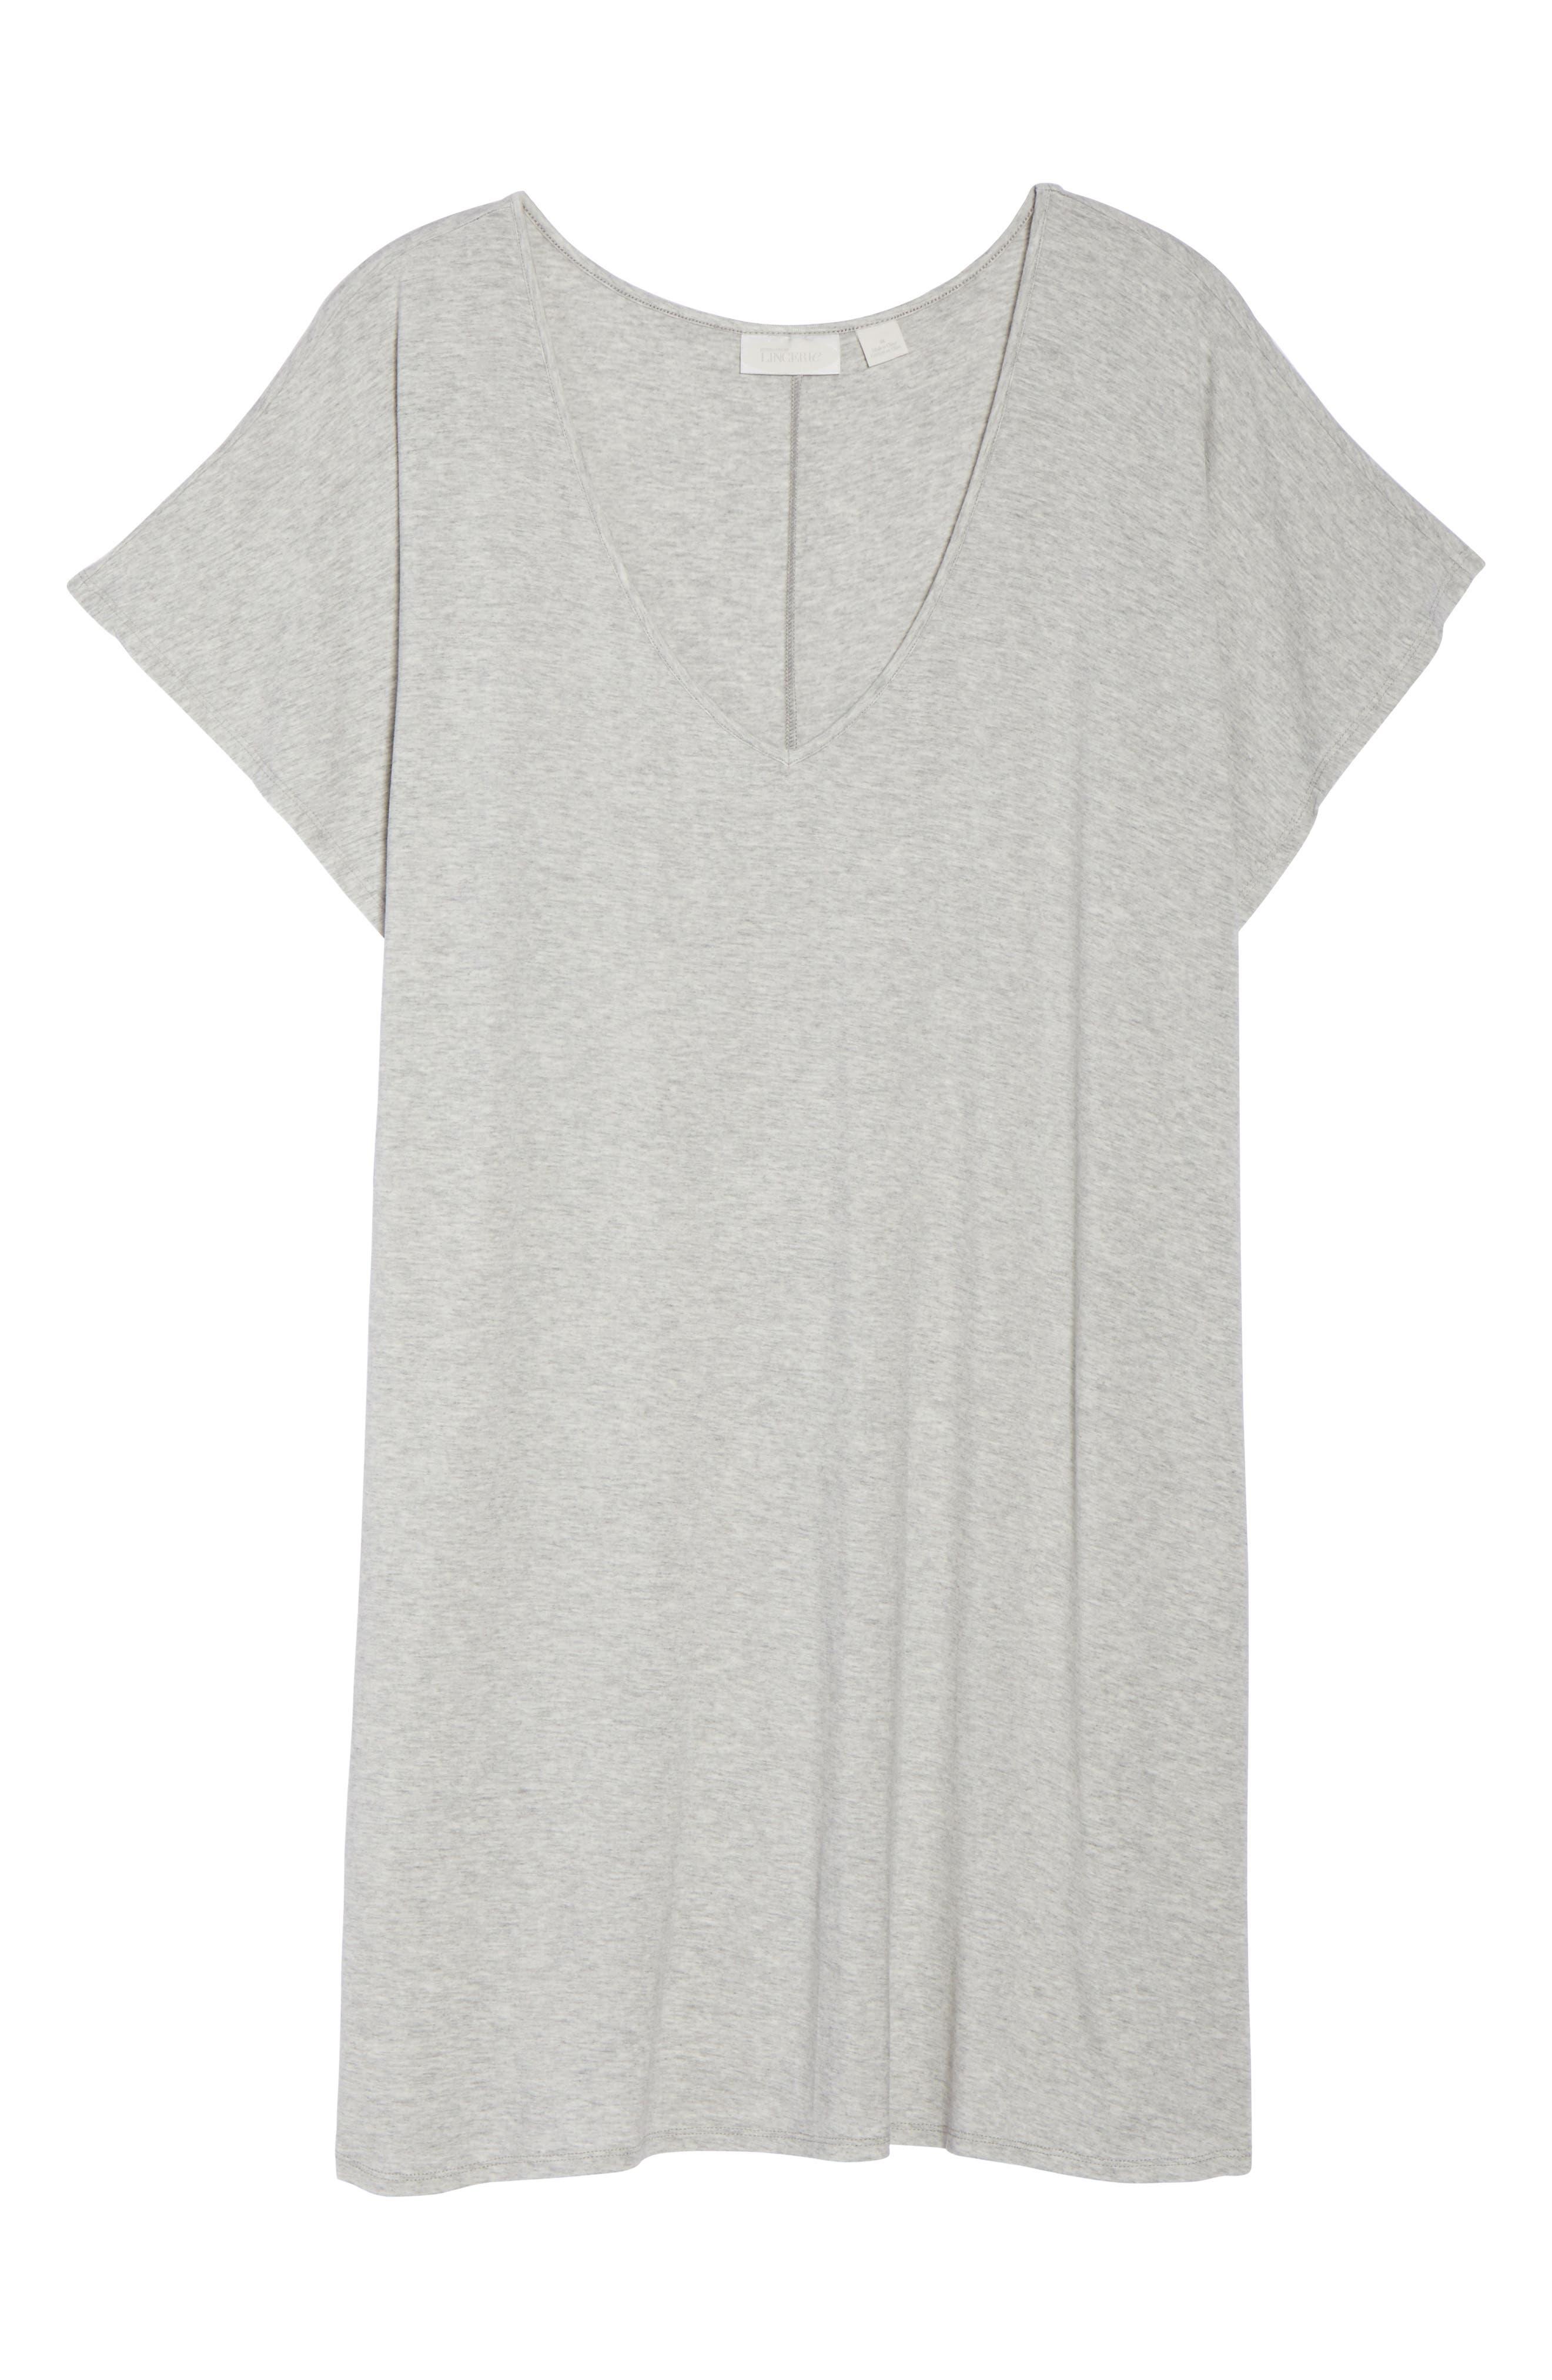 Dolman Sleeve Nightshirt,                             Alternate thumbnail 6, color,                             Grey Pearl Heather